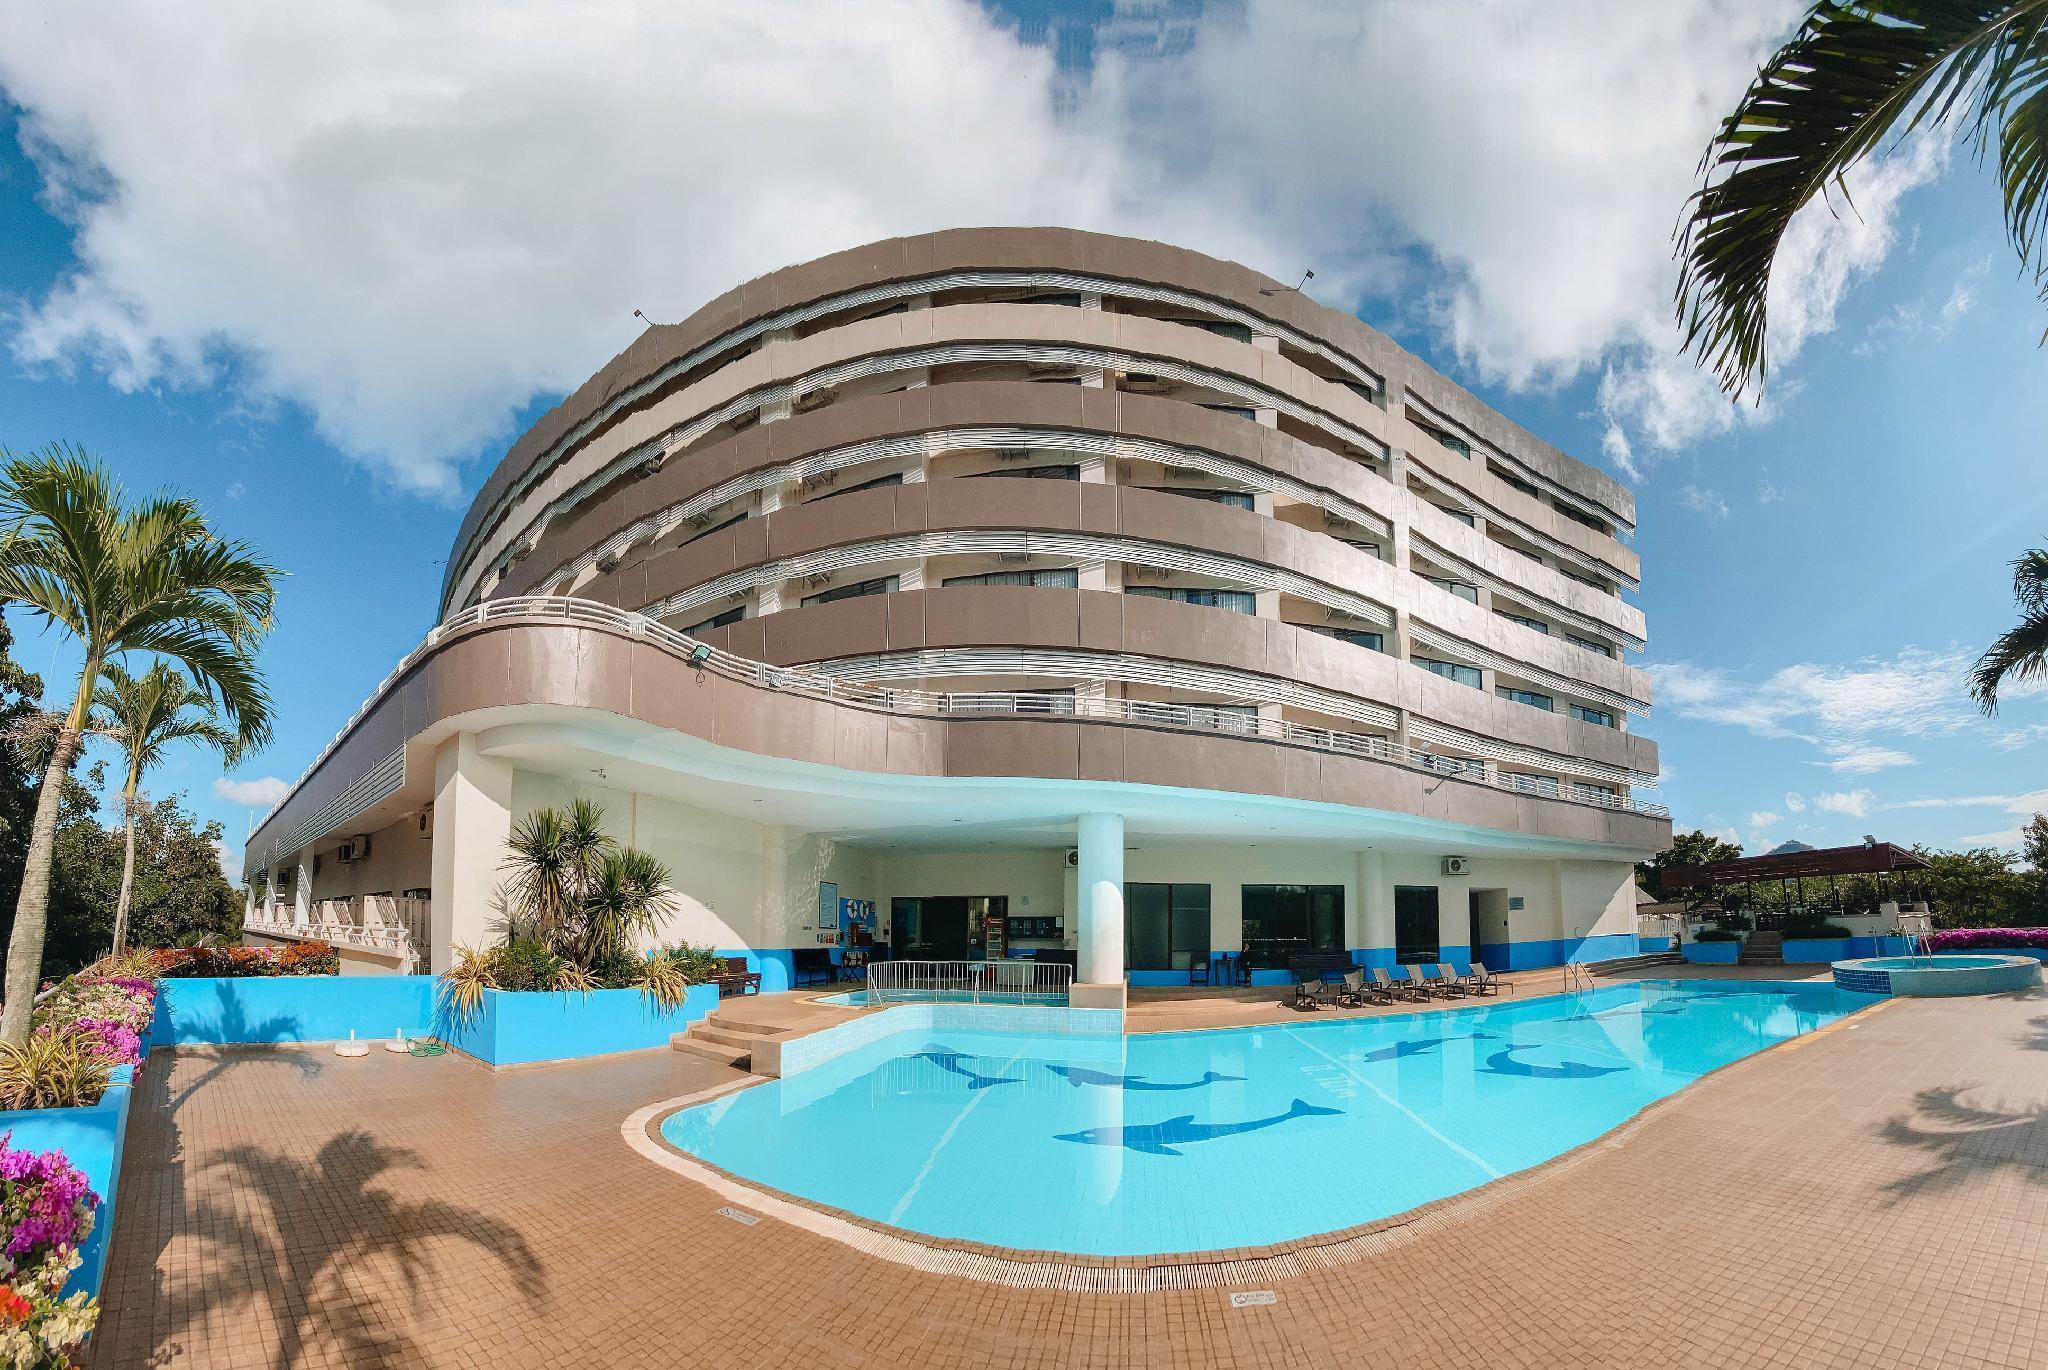 Loei Palace Hotel โรงแรมเลย พาเลซ